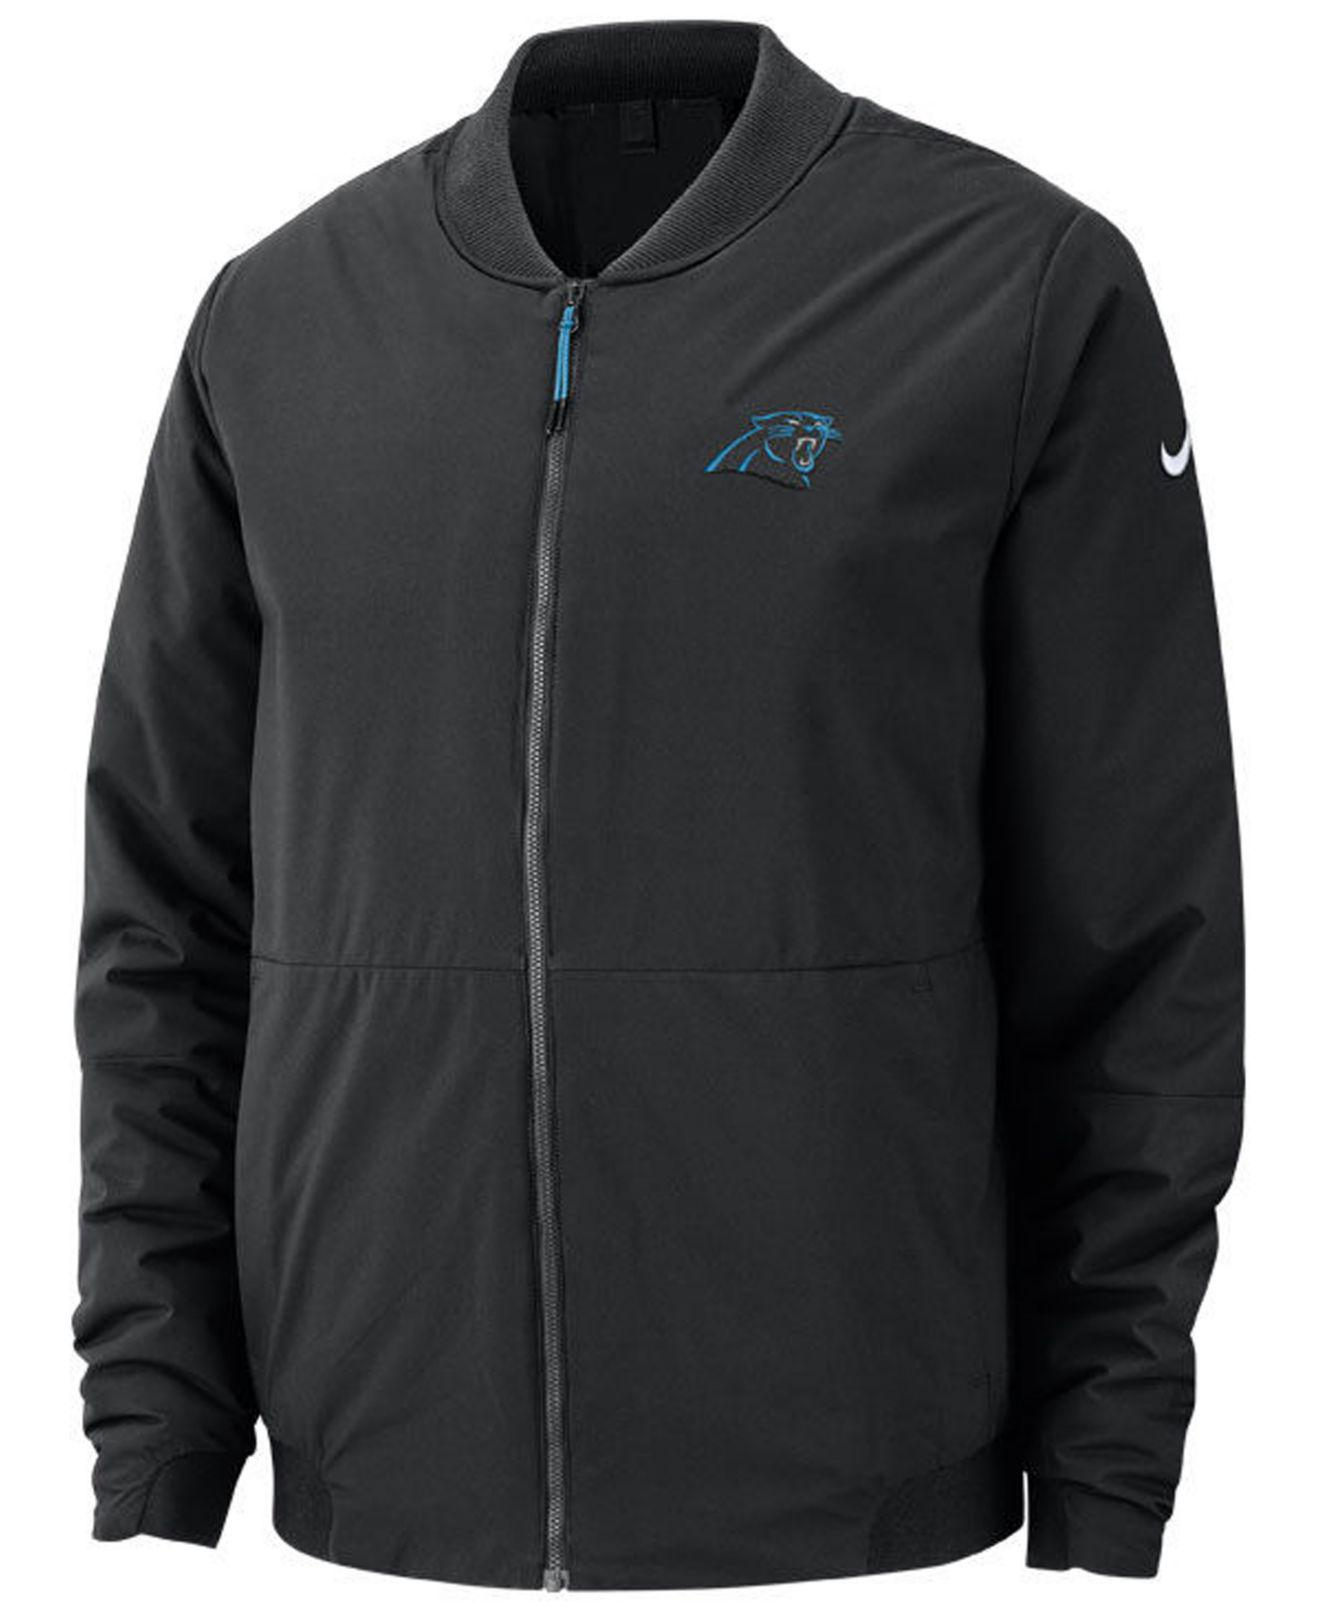 Lyst - Nike Carolina Panthers Bomber Jacket in Black for Men e9f6ed2e6073